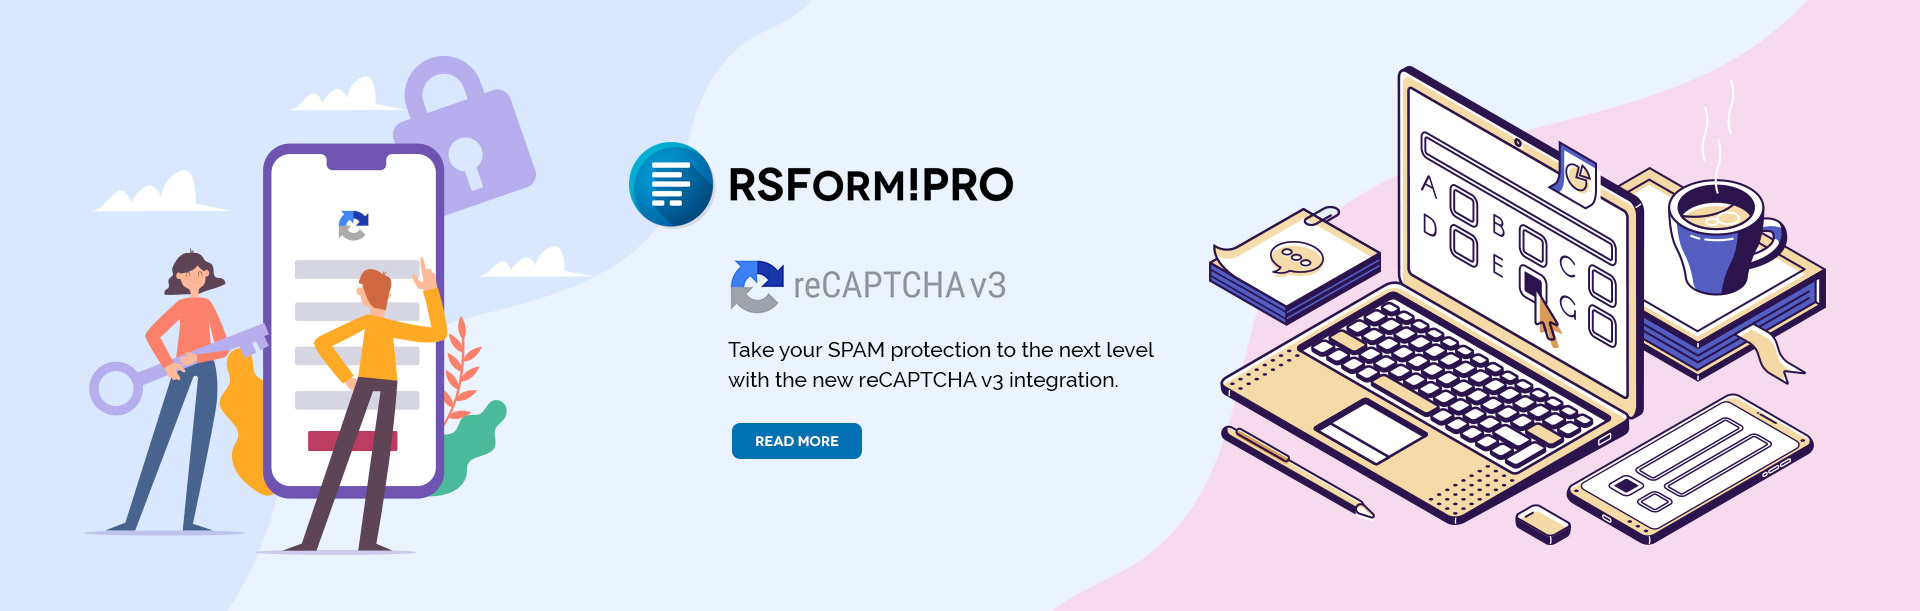 RSForm!Pro reCAPTCHA v3 integration